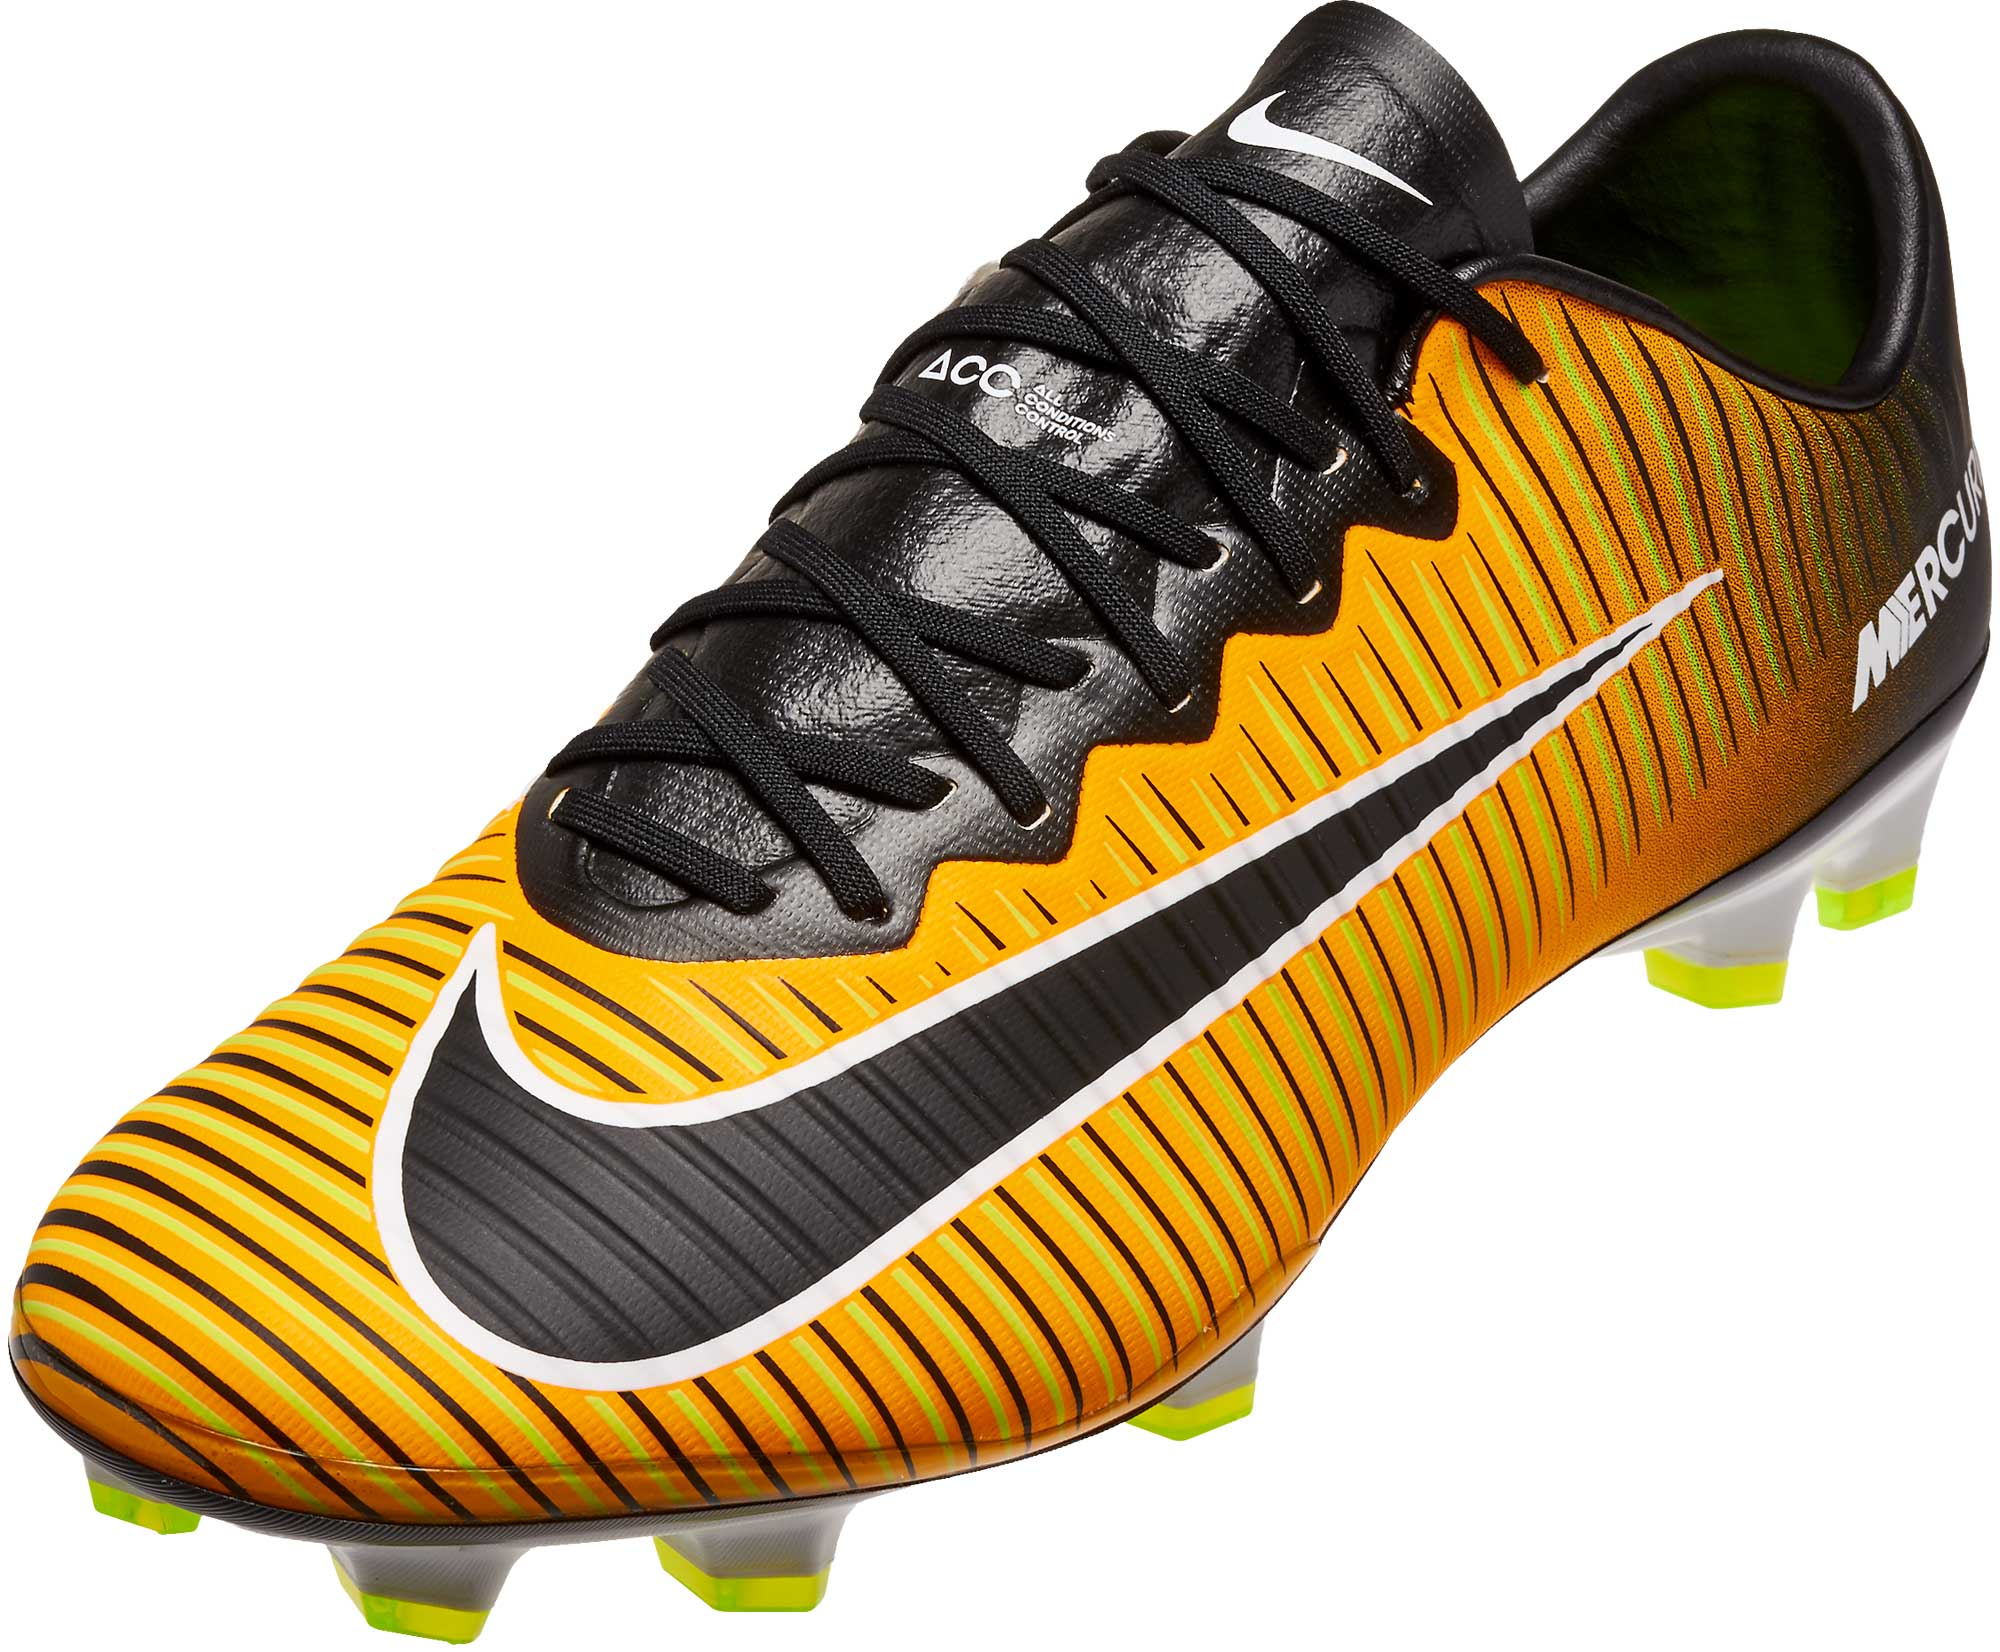 e134f581868f Nike Mercurial Vapor XI FG Soccer Cleats - Laser Orange   Black ...